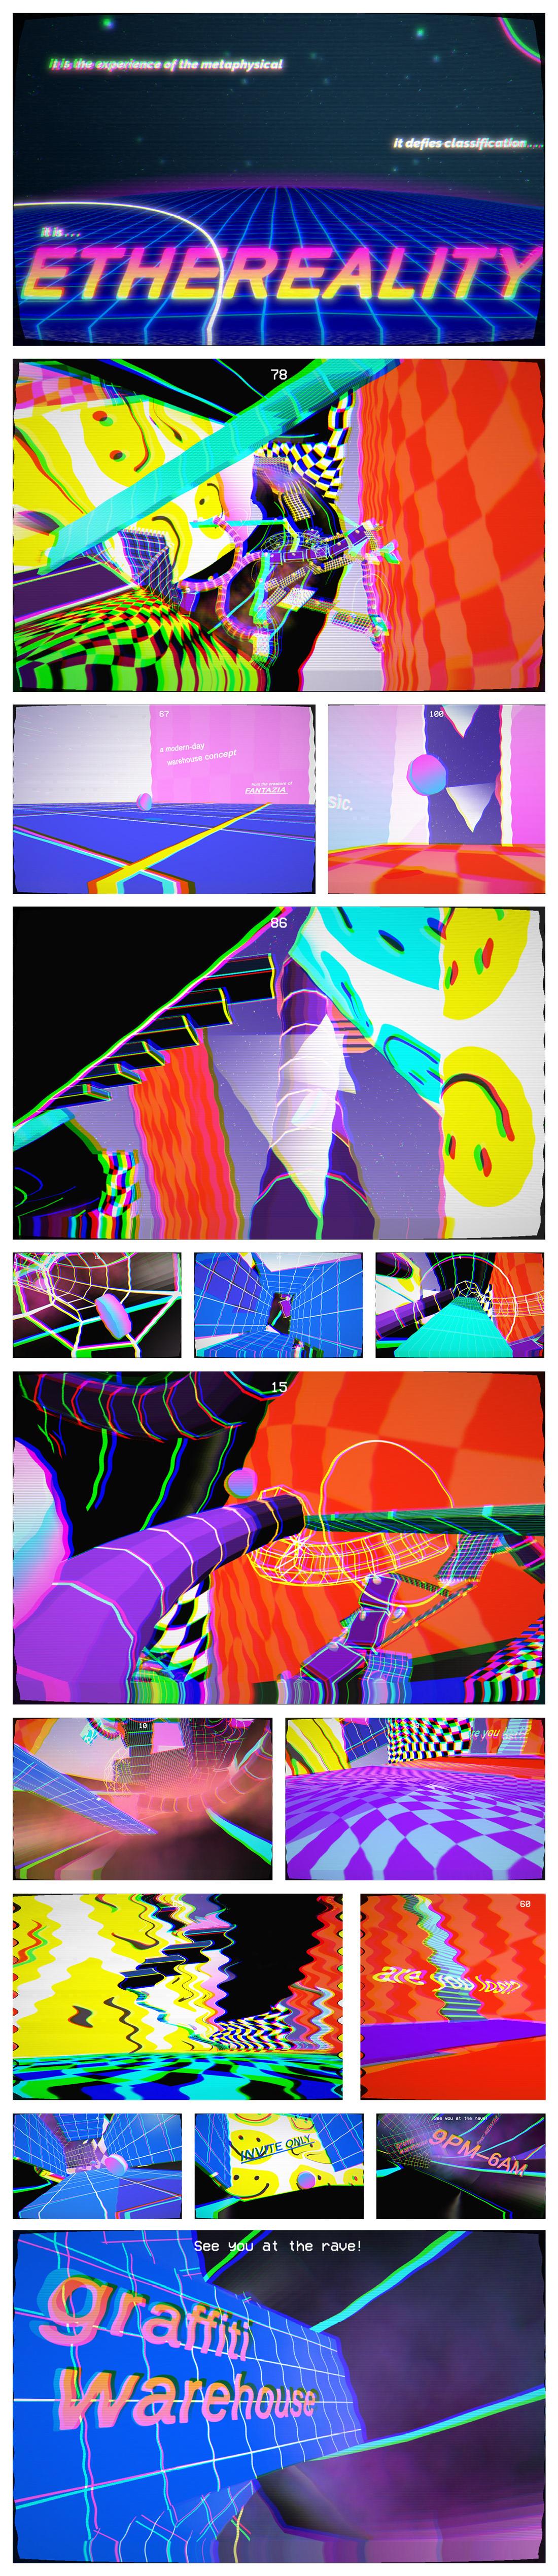 rave interactive flyer  nostalgia experimental graphic design 3d Poster retro design New Wave web art trippy adobeawards